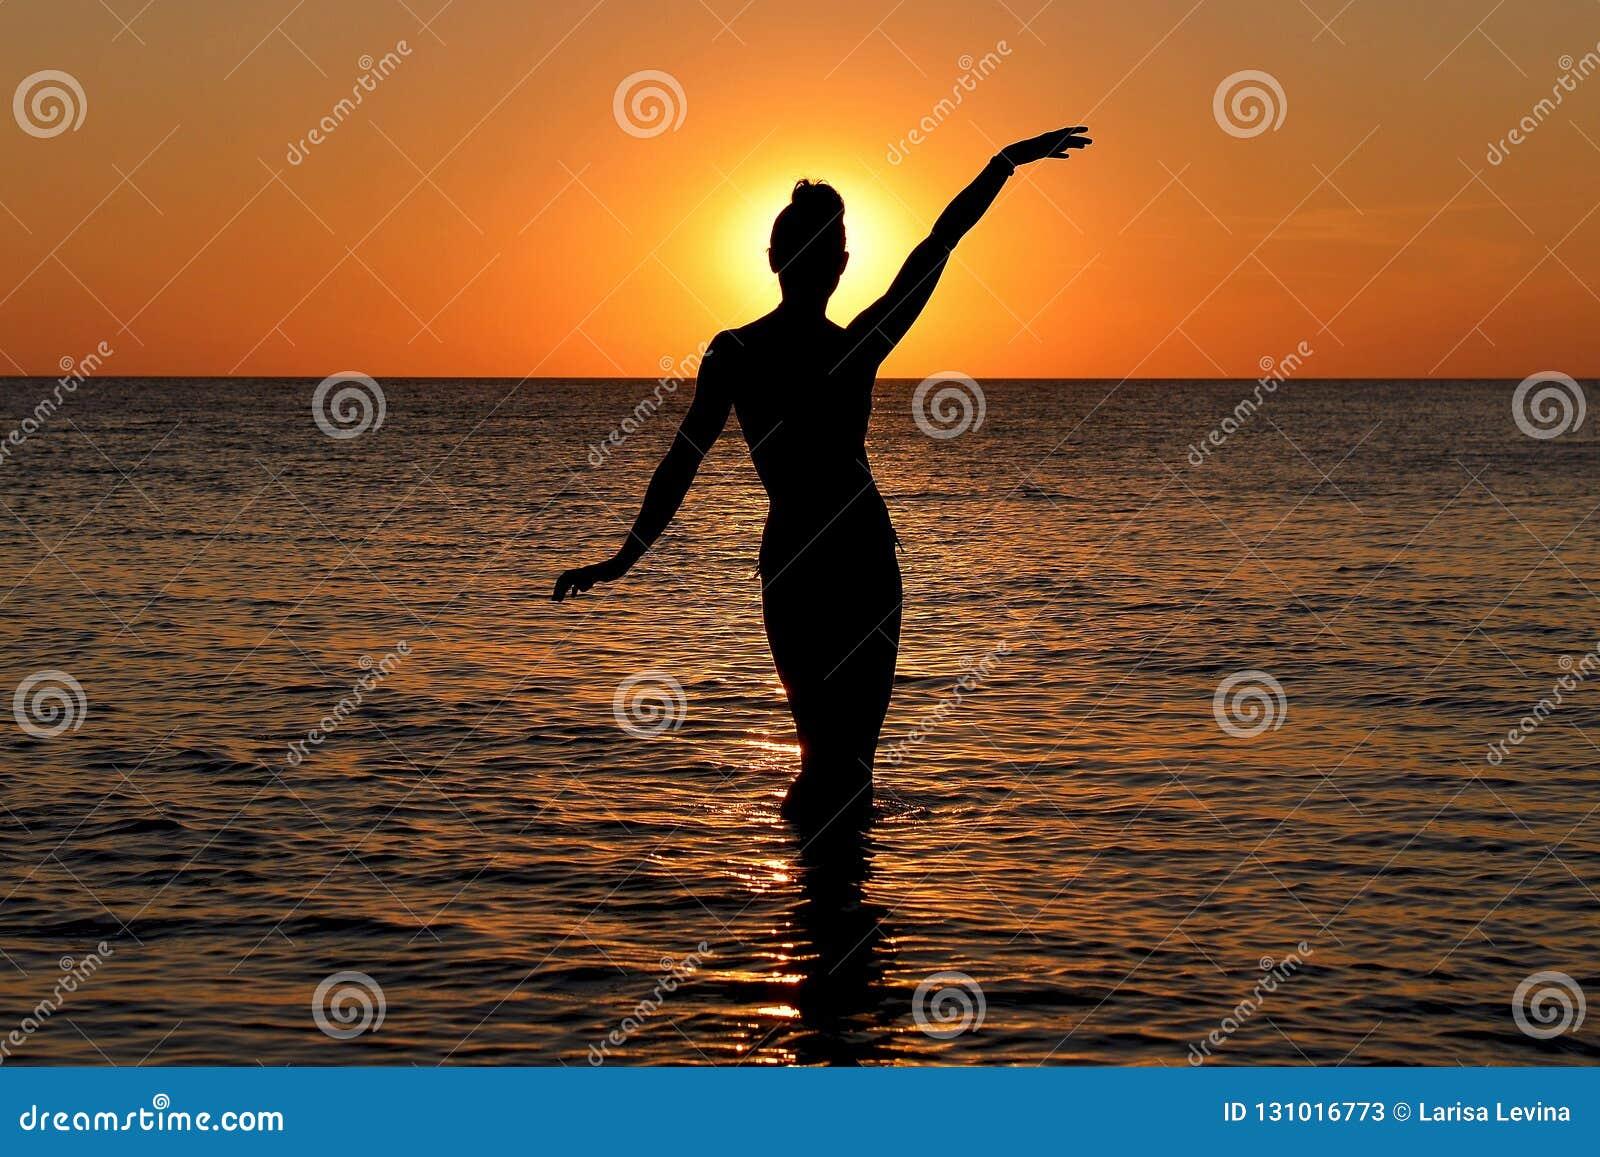 Silueta de una figura femenina misteriosa en el fondo de la puesta del sol del mar